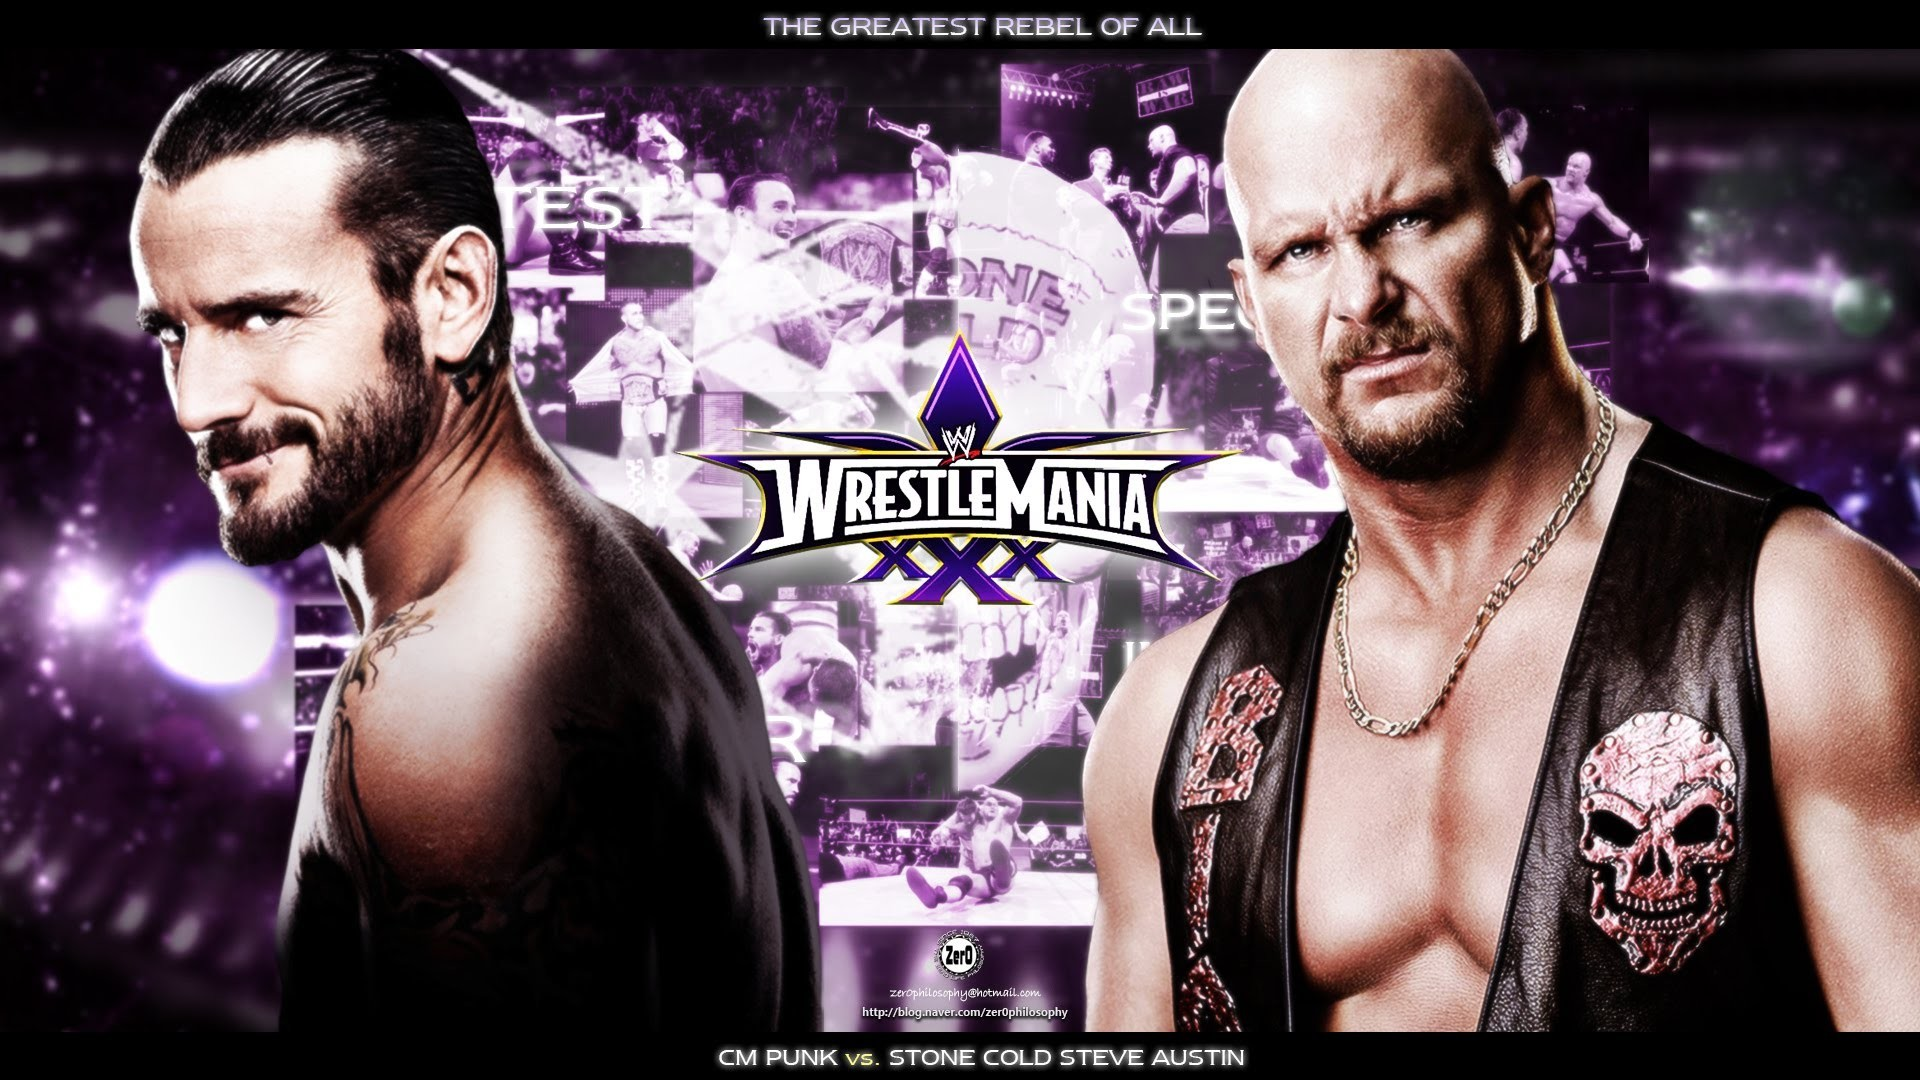 WWE 13 WrestleMania 30 Cm Punk Vs Stone Cold Steve Austin Match Gameplay –  YouTube